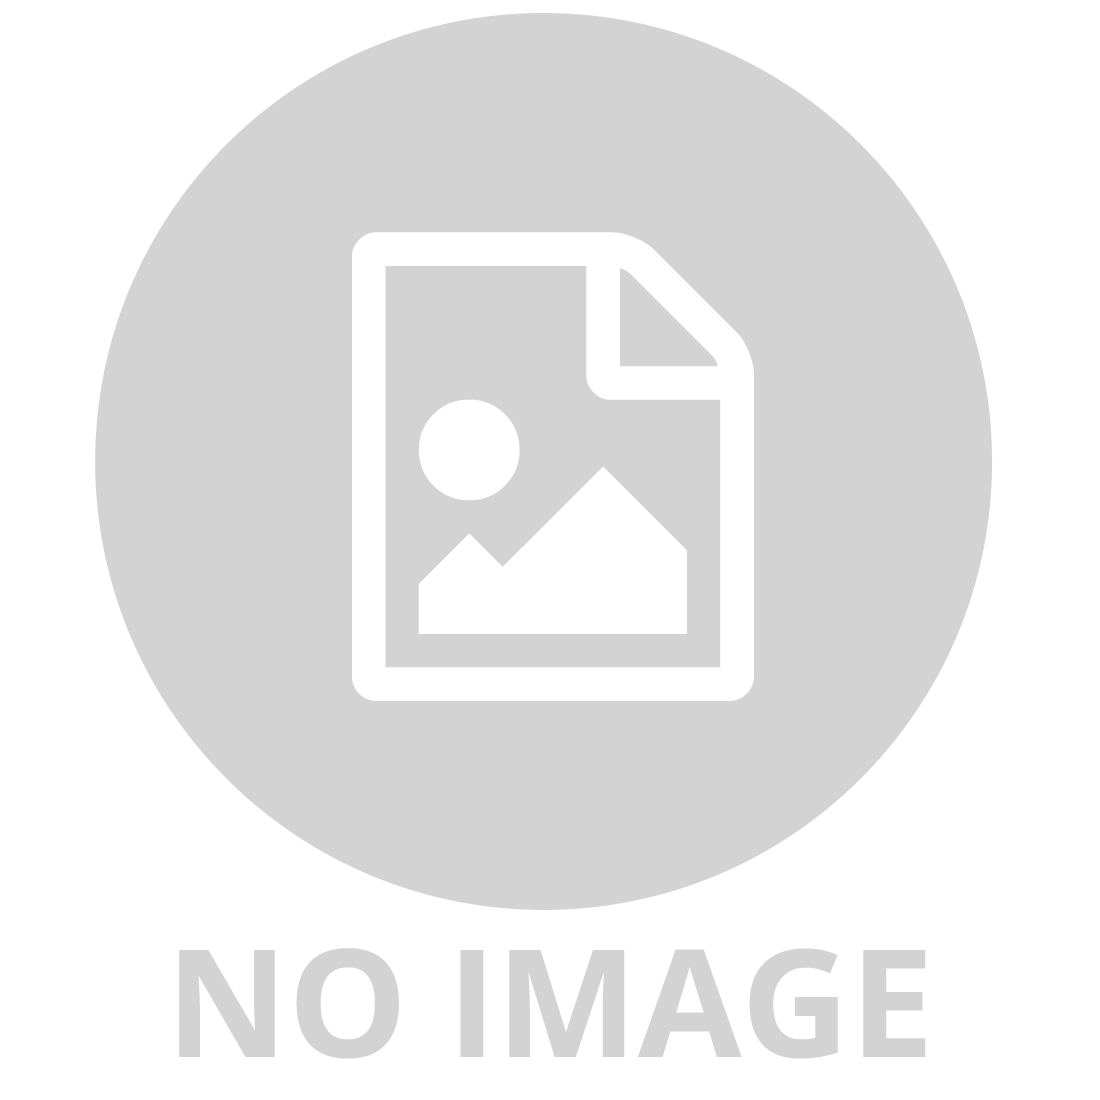 LEGO NINJAGO 70637 COLE - SPINJITZU MASTER